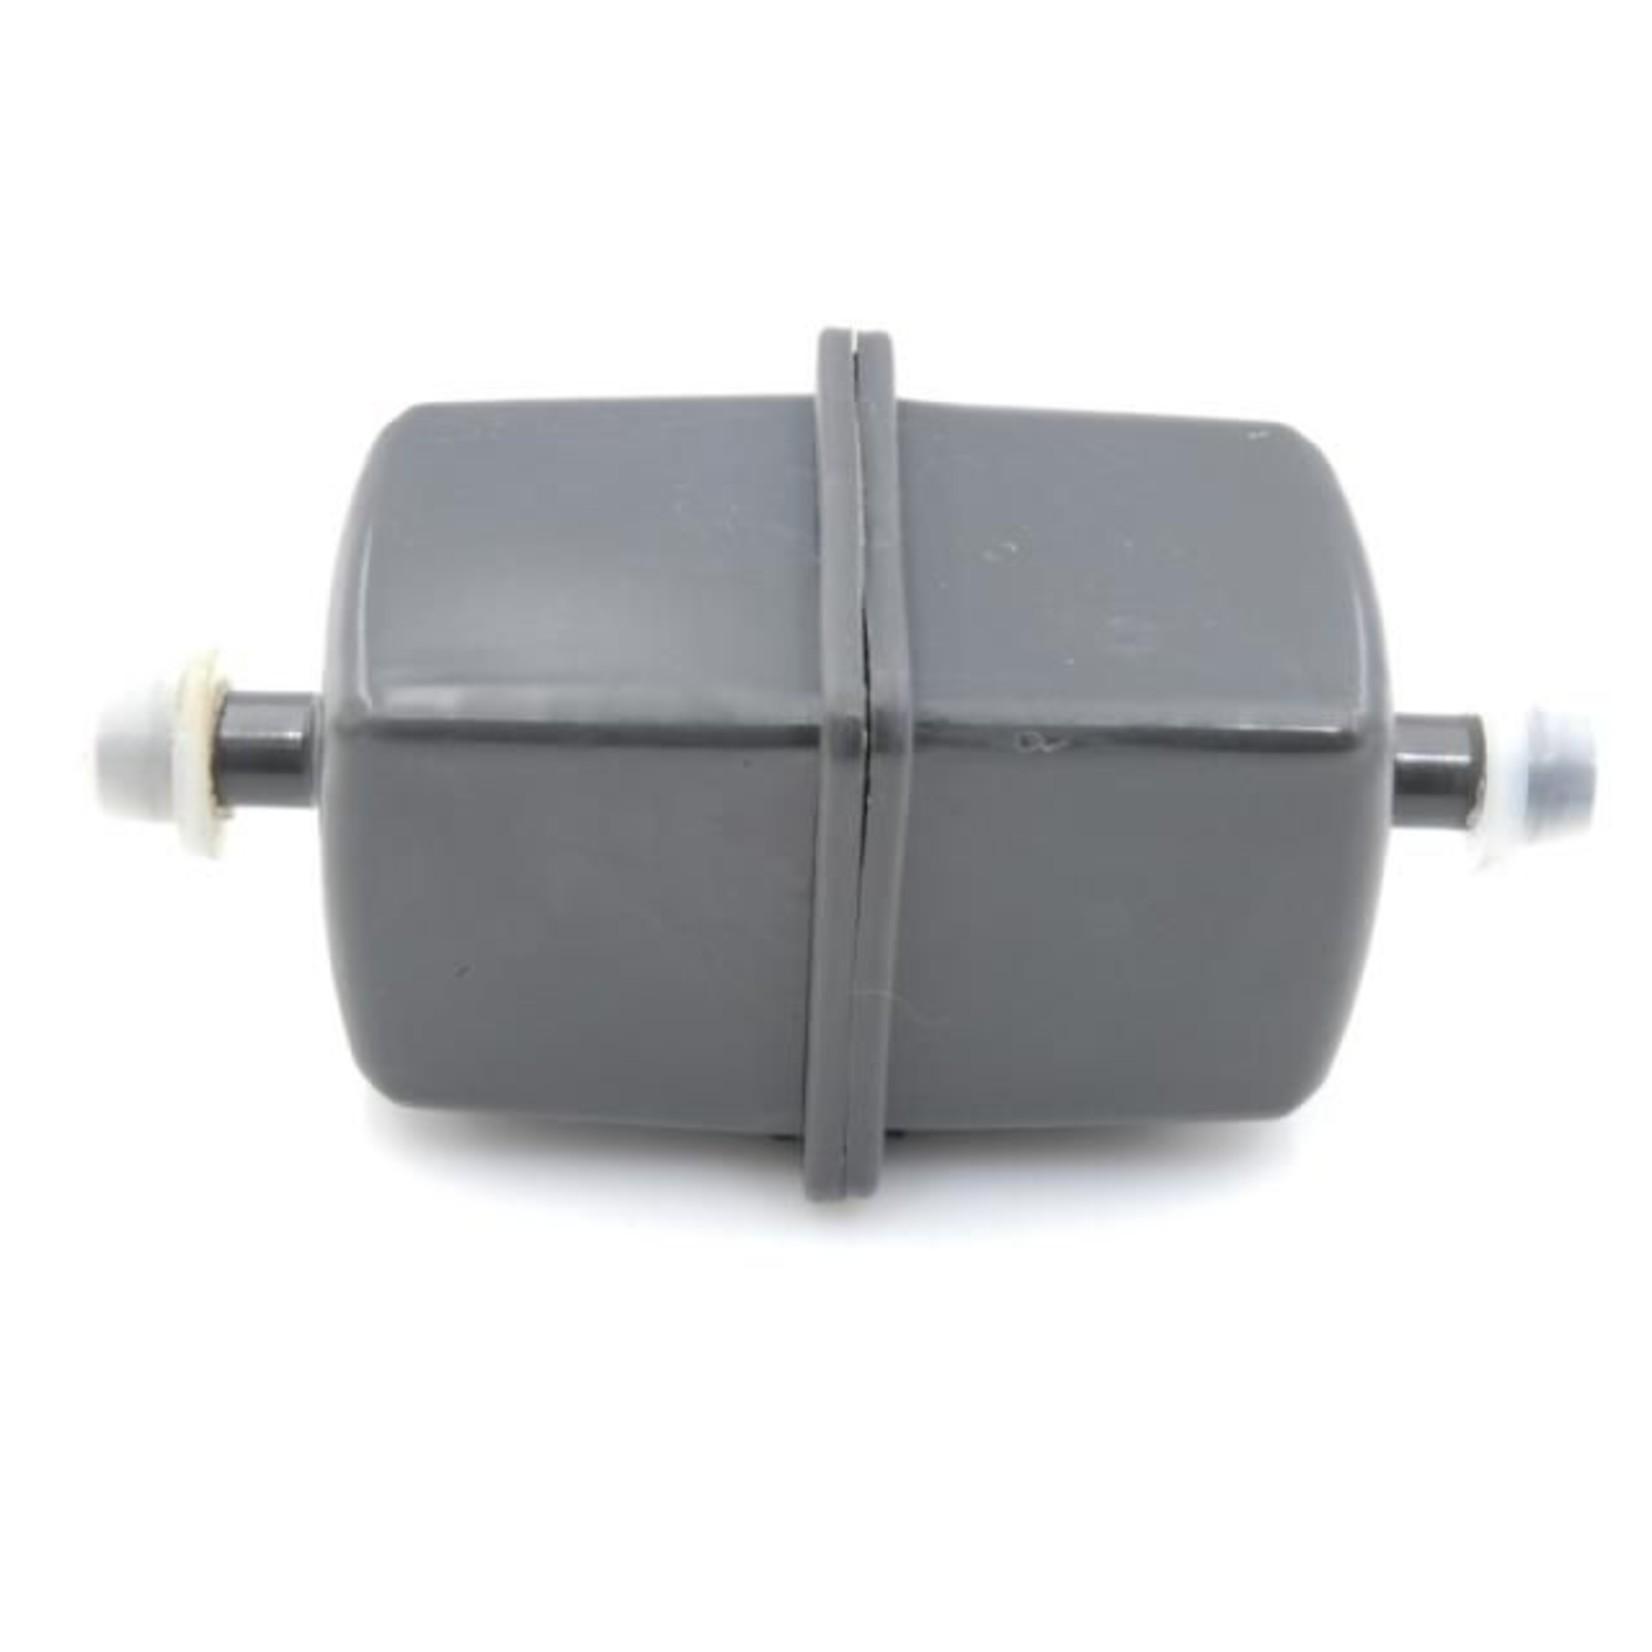 Filtro de gasolina Nr Org: DX173202A